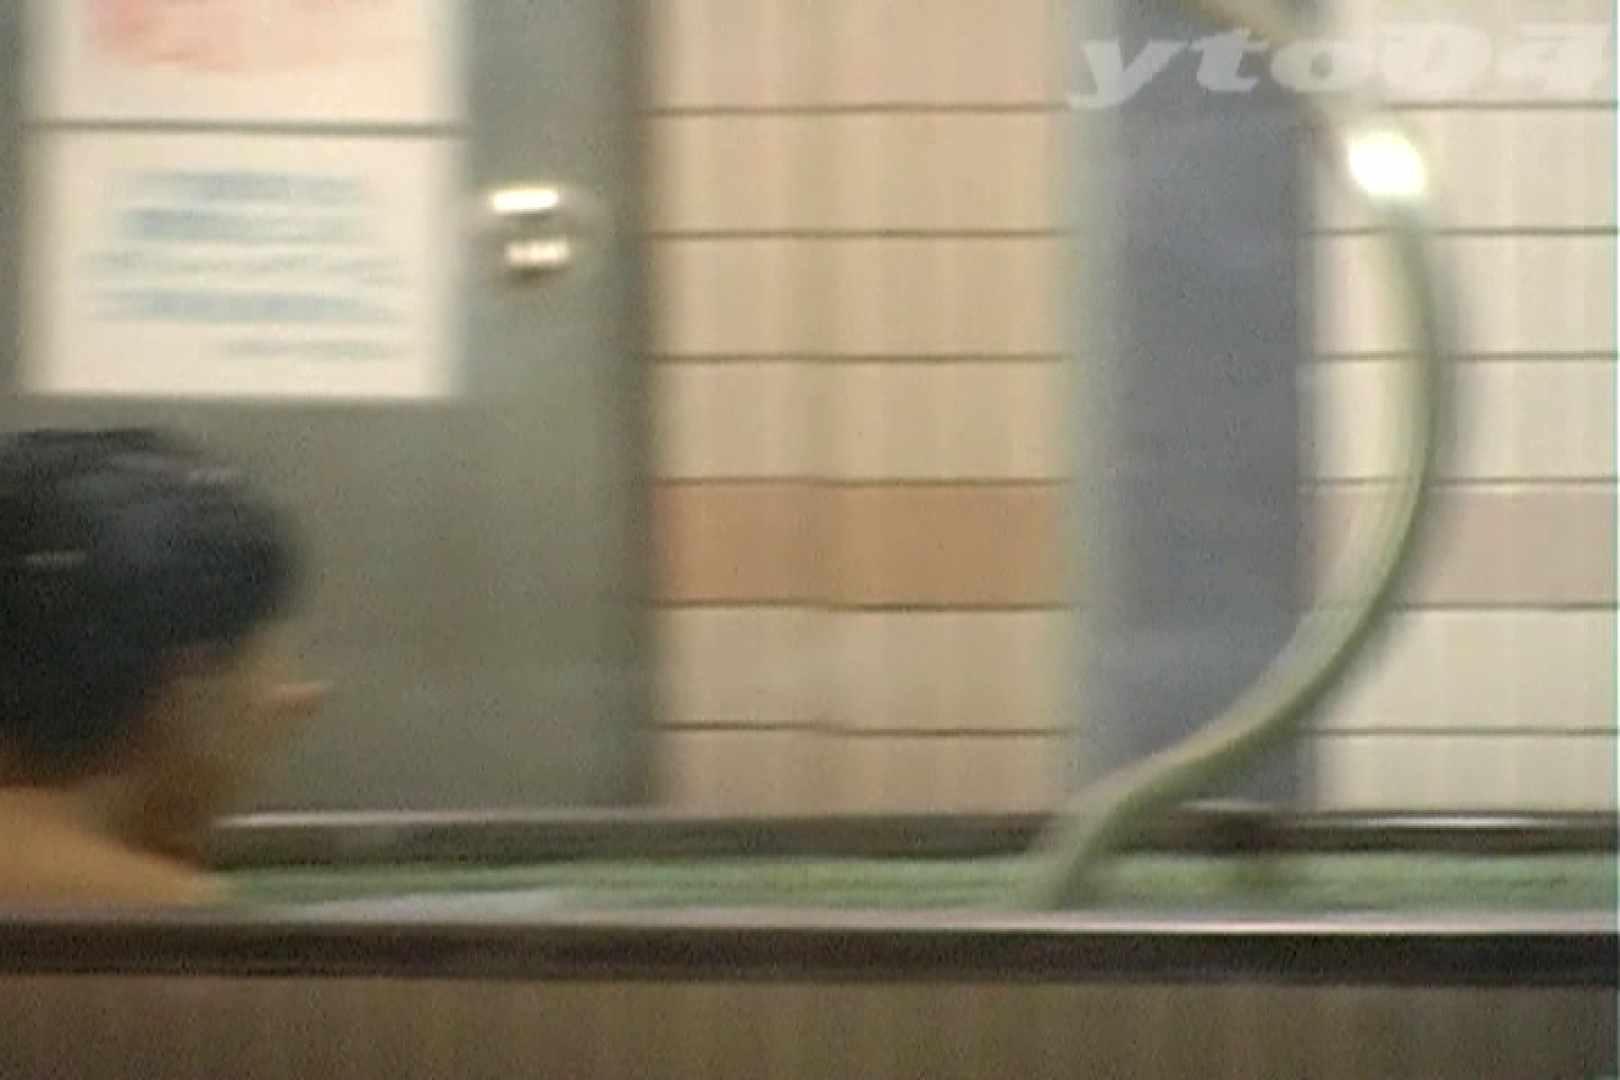 ▲復活限定▲合宿ホテル女風呂盗撮 Vol.24 ホテル 盗撮動画紹介 50PIX 21